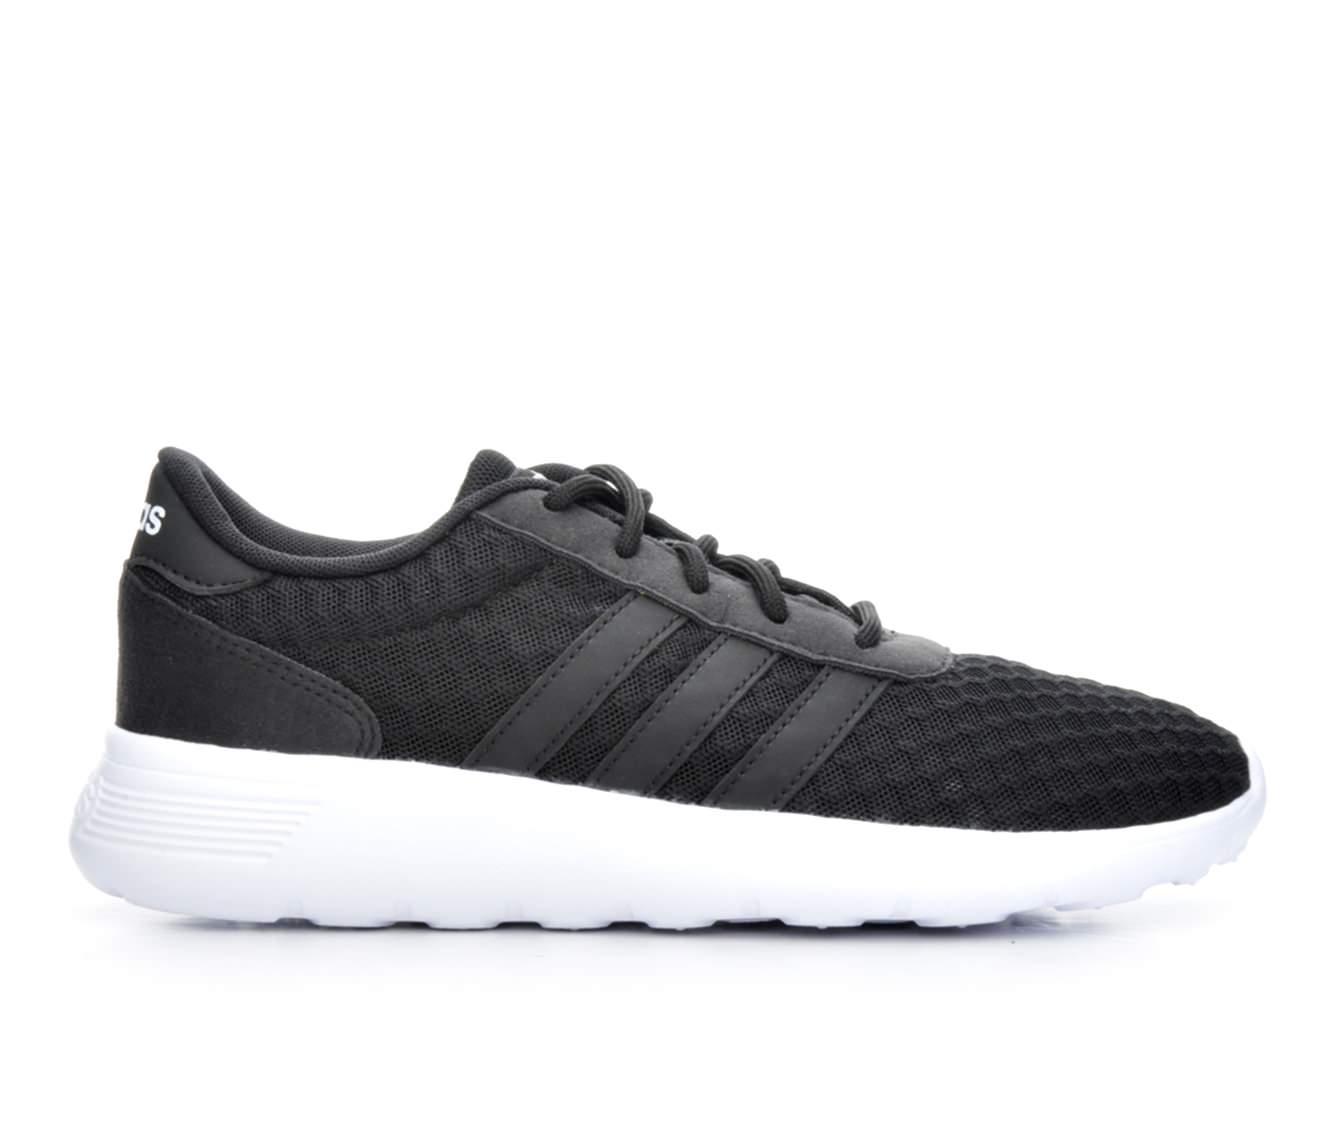 Women's Adidas Lite Racer Running Shoes (Black - Size 5) 1608923